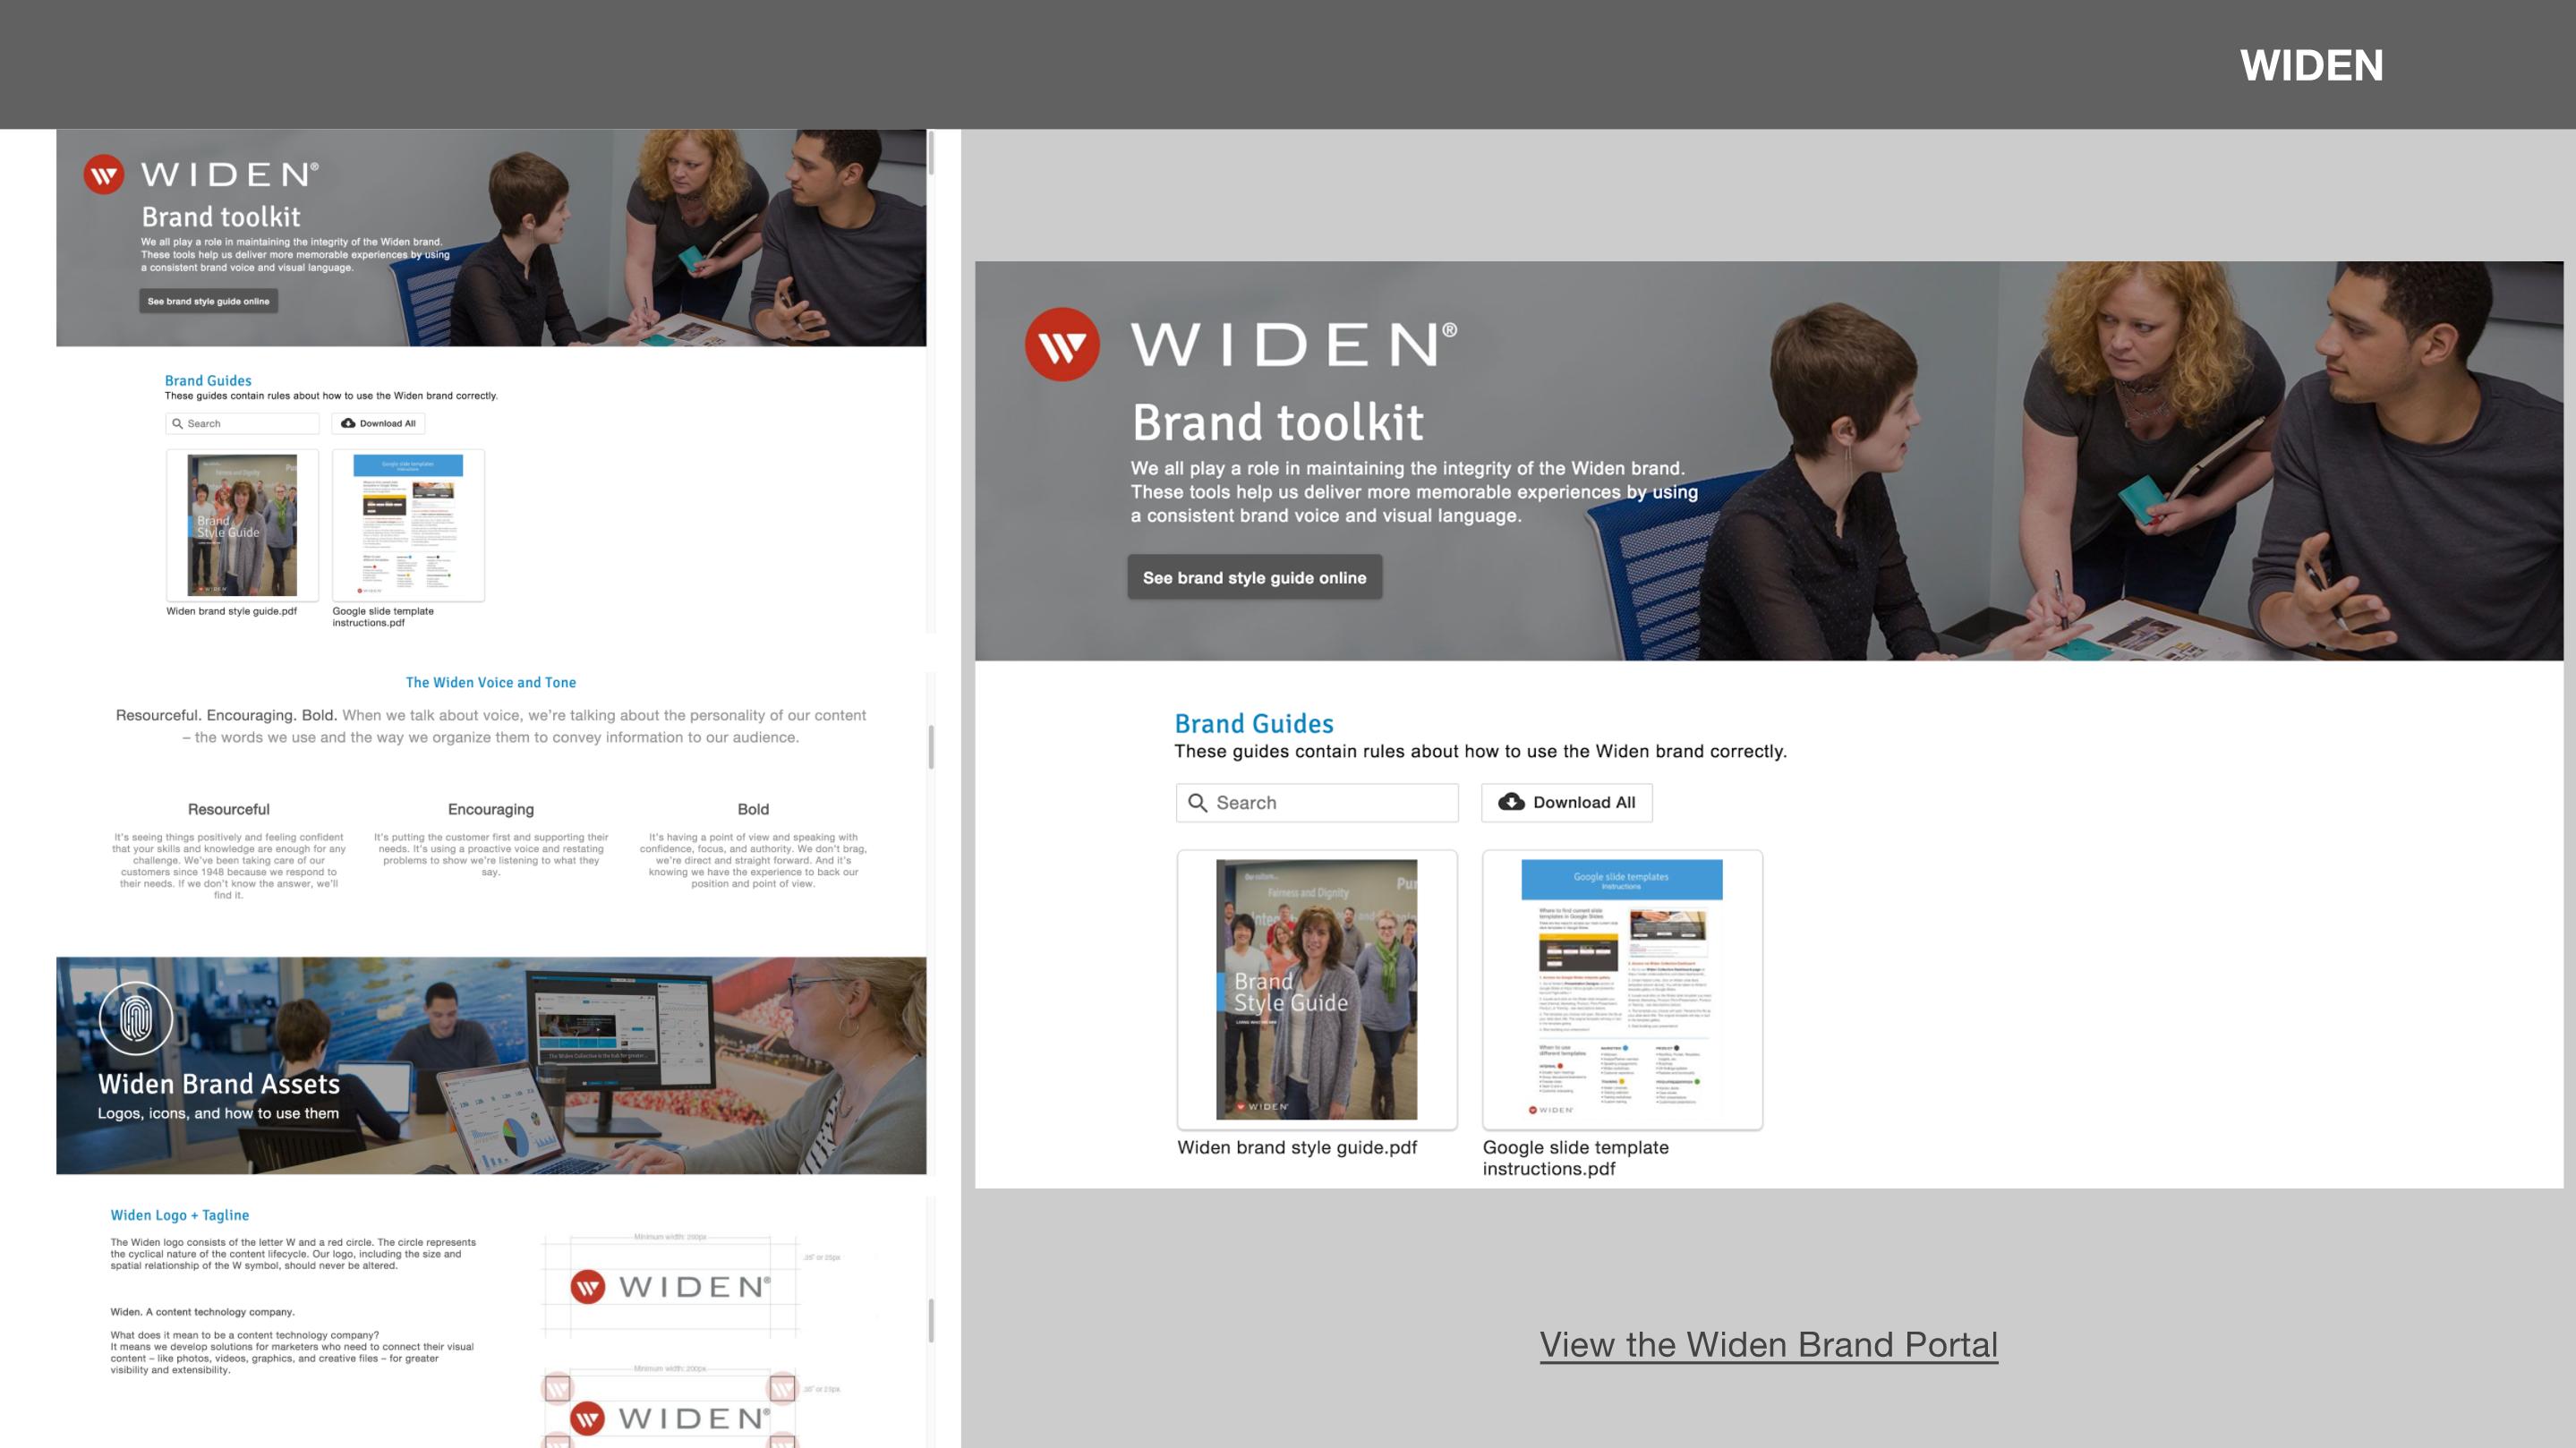 Widen Content Curation & Brand Portals